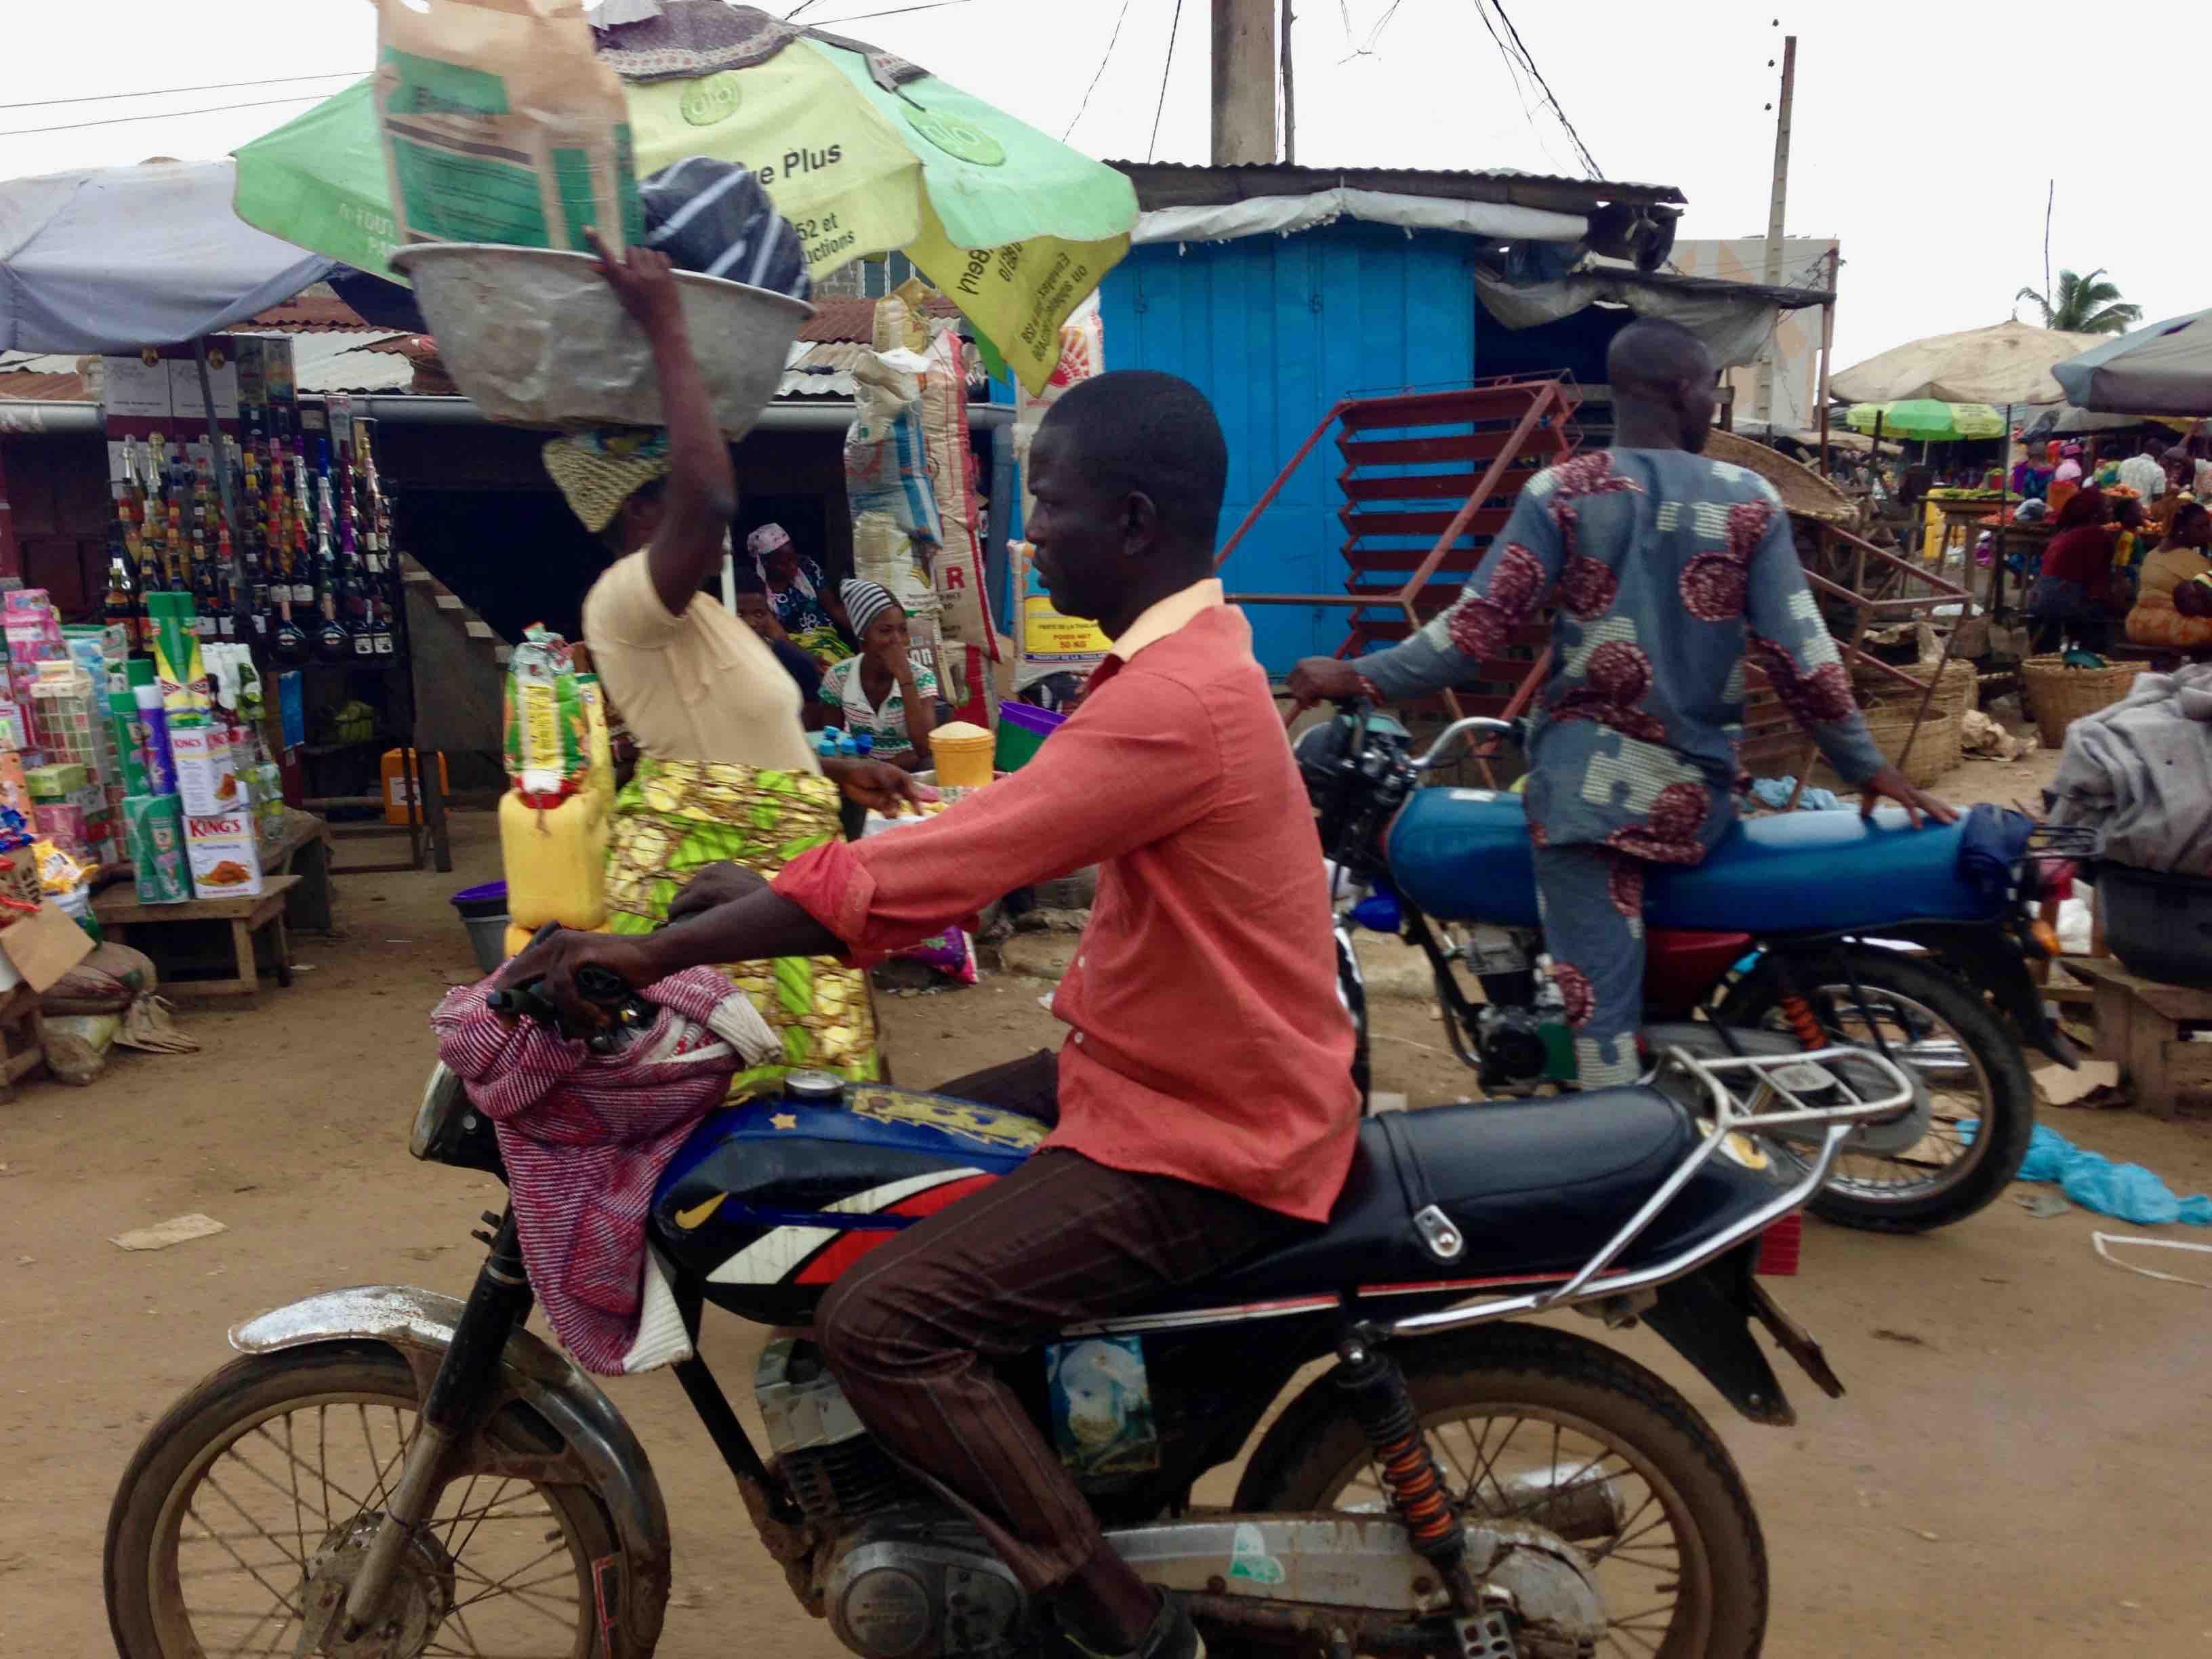 Market Scene, Seme, Queme, Benin. #JujuFilms